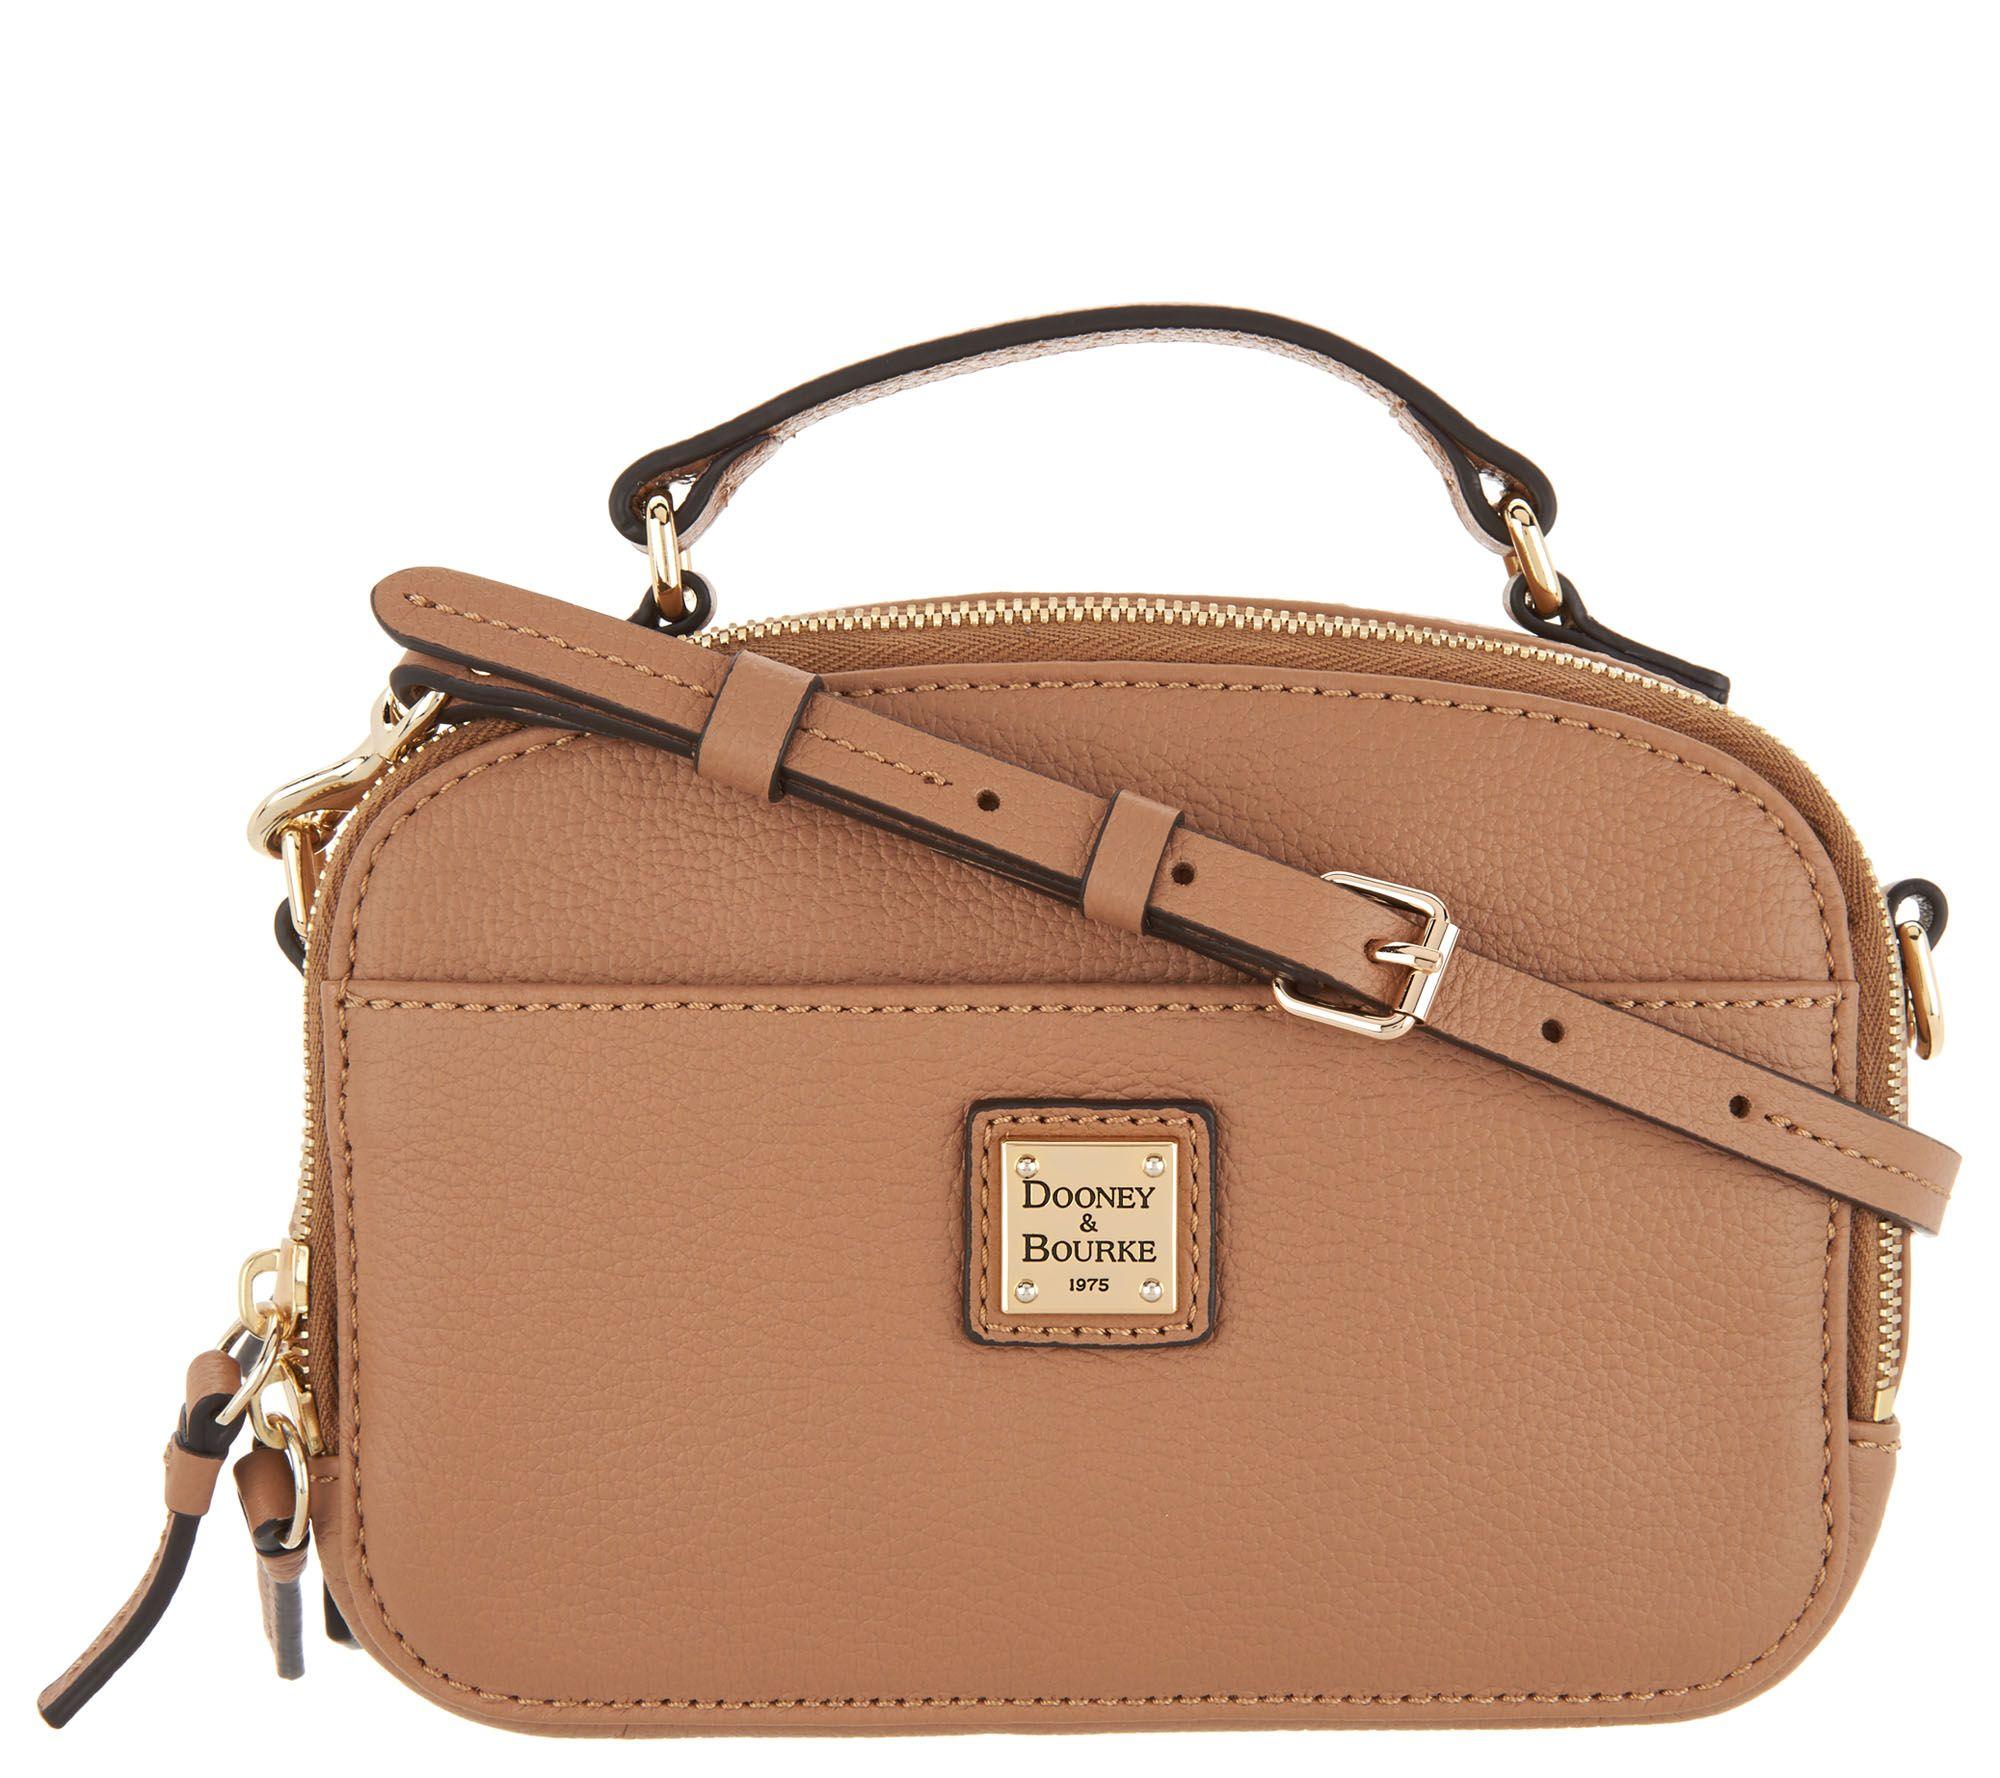 Dooney & Bourke Belvedere Leather Crossbody Handbag - Page 1 — QVC.com